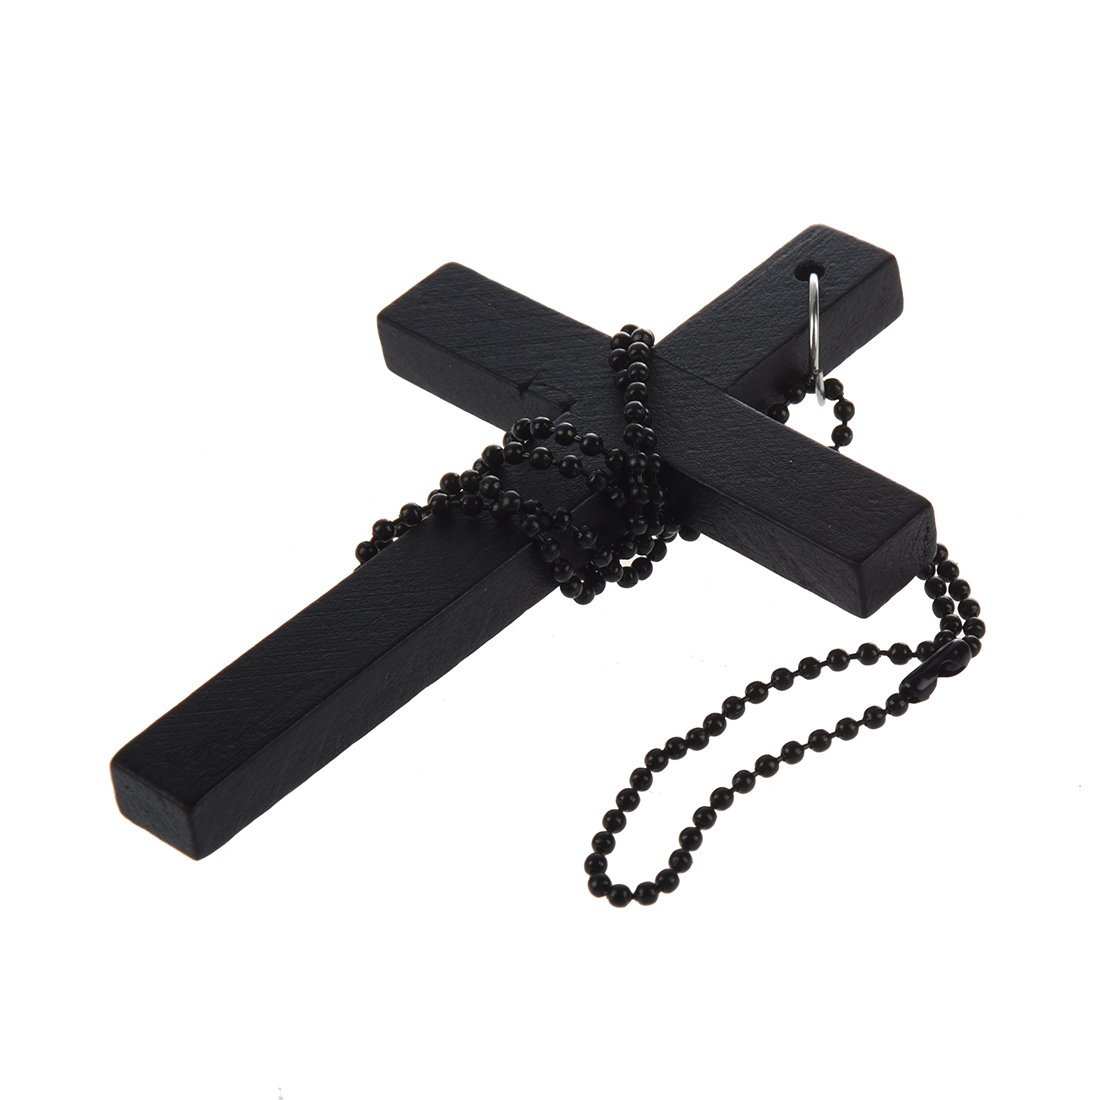 10x(Metal Beaded Chain Wooden Cross Pendant Necklace Black L3